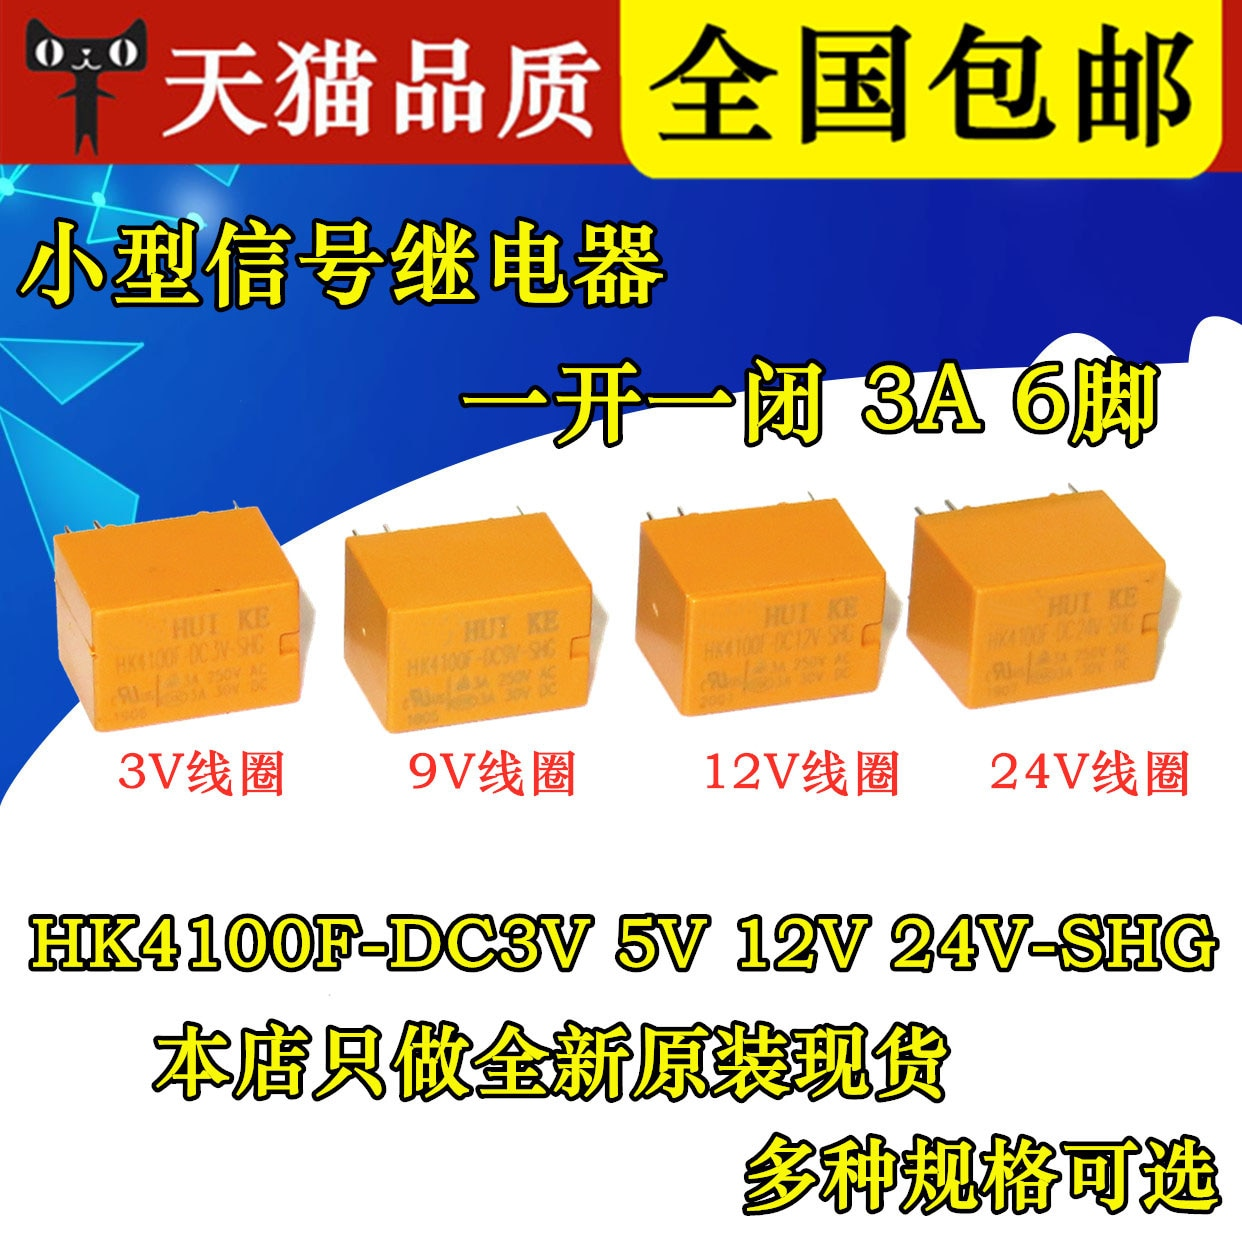 HK4101F HK4100F-DC12V-SHG DC 3V 5V 9V 12V 24V-SHG 6P-3A